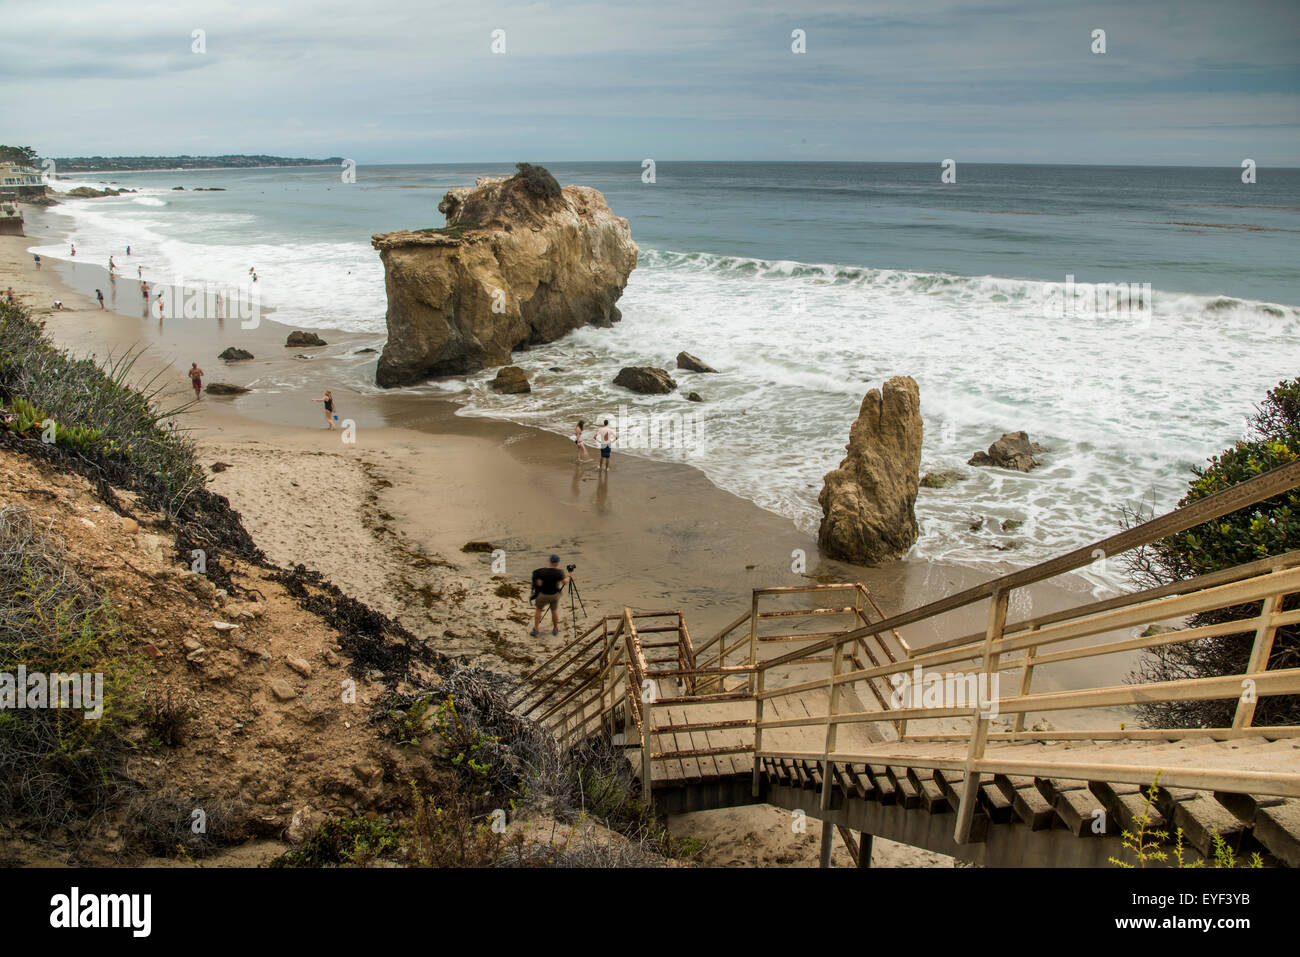 The staircase down to Matador Beach - Malibu Stock Photo